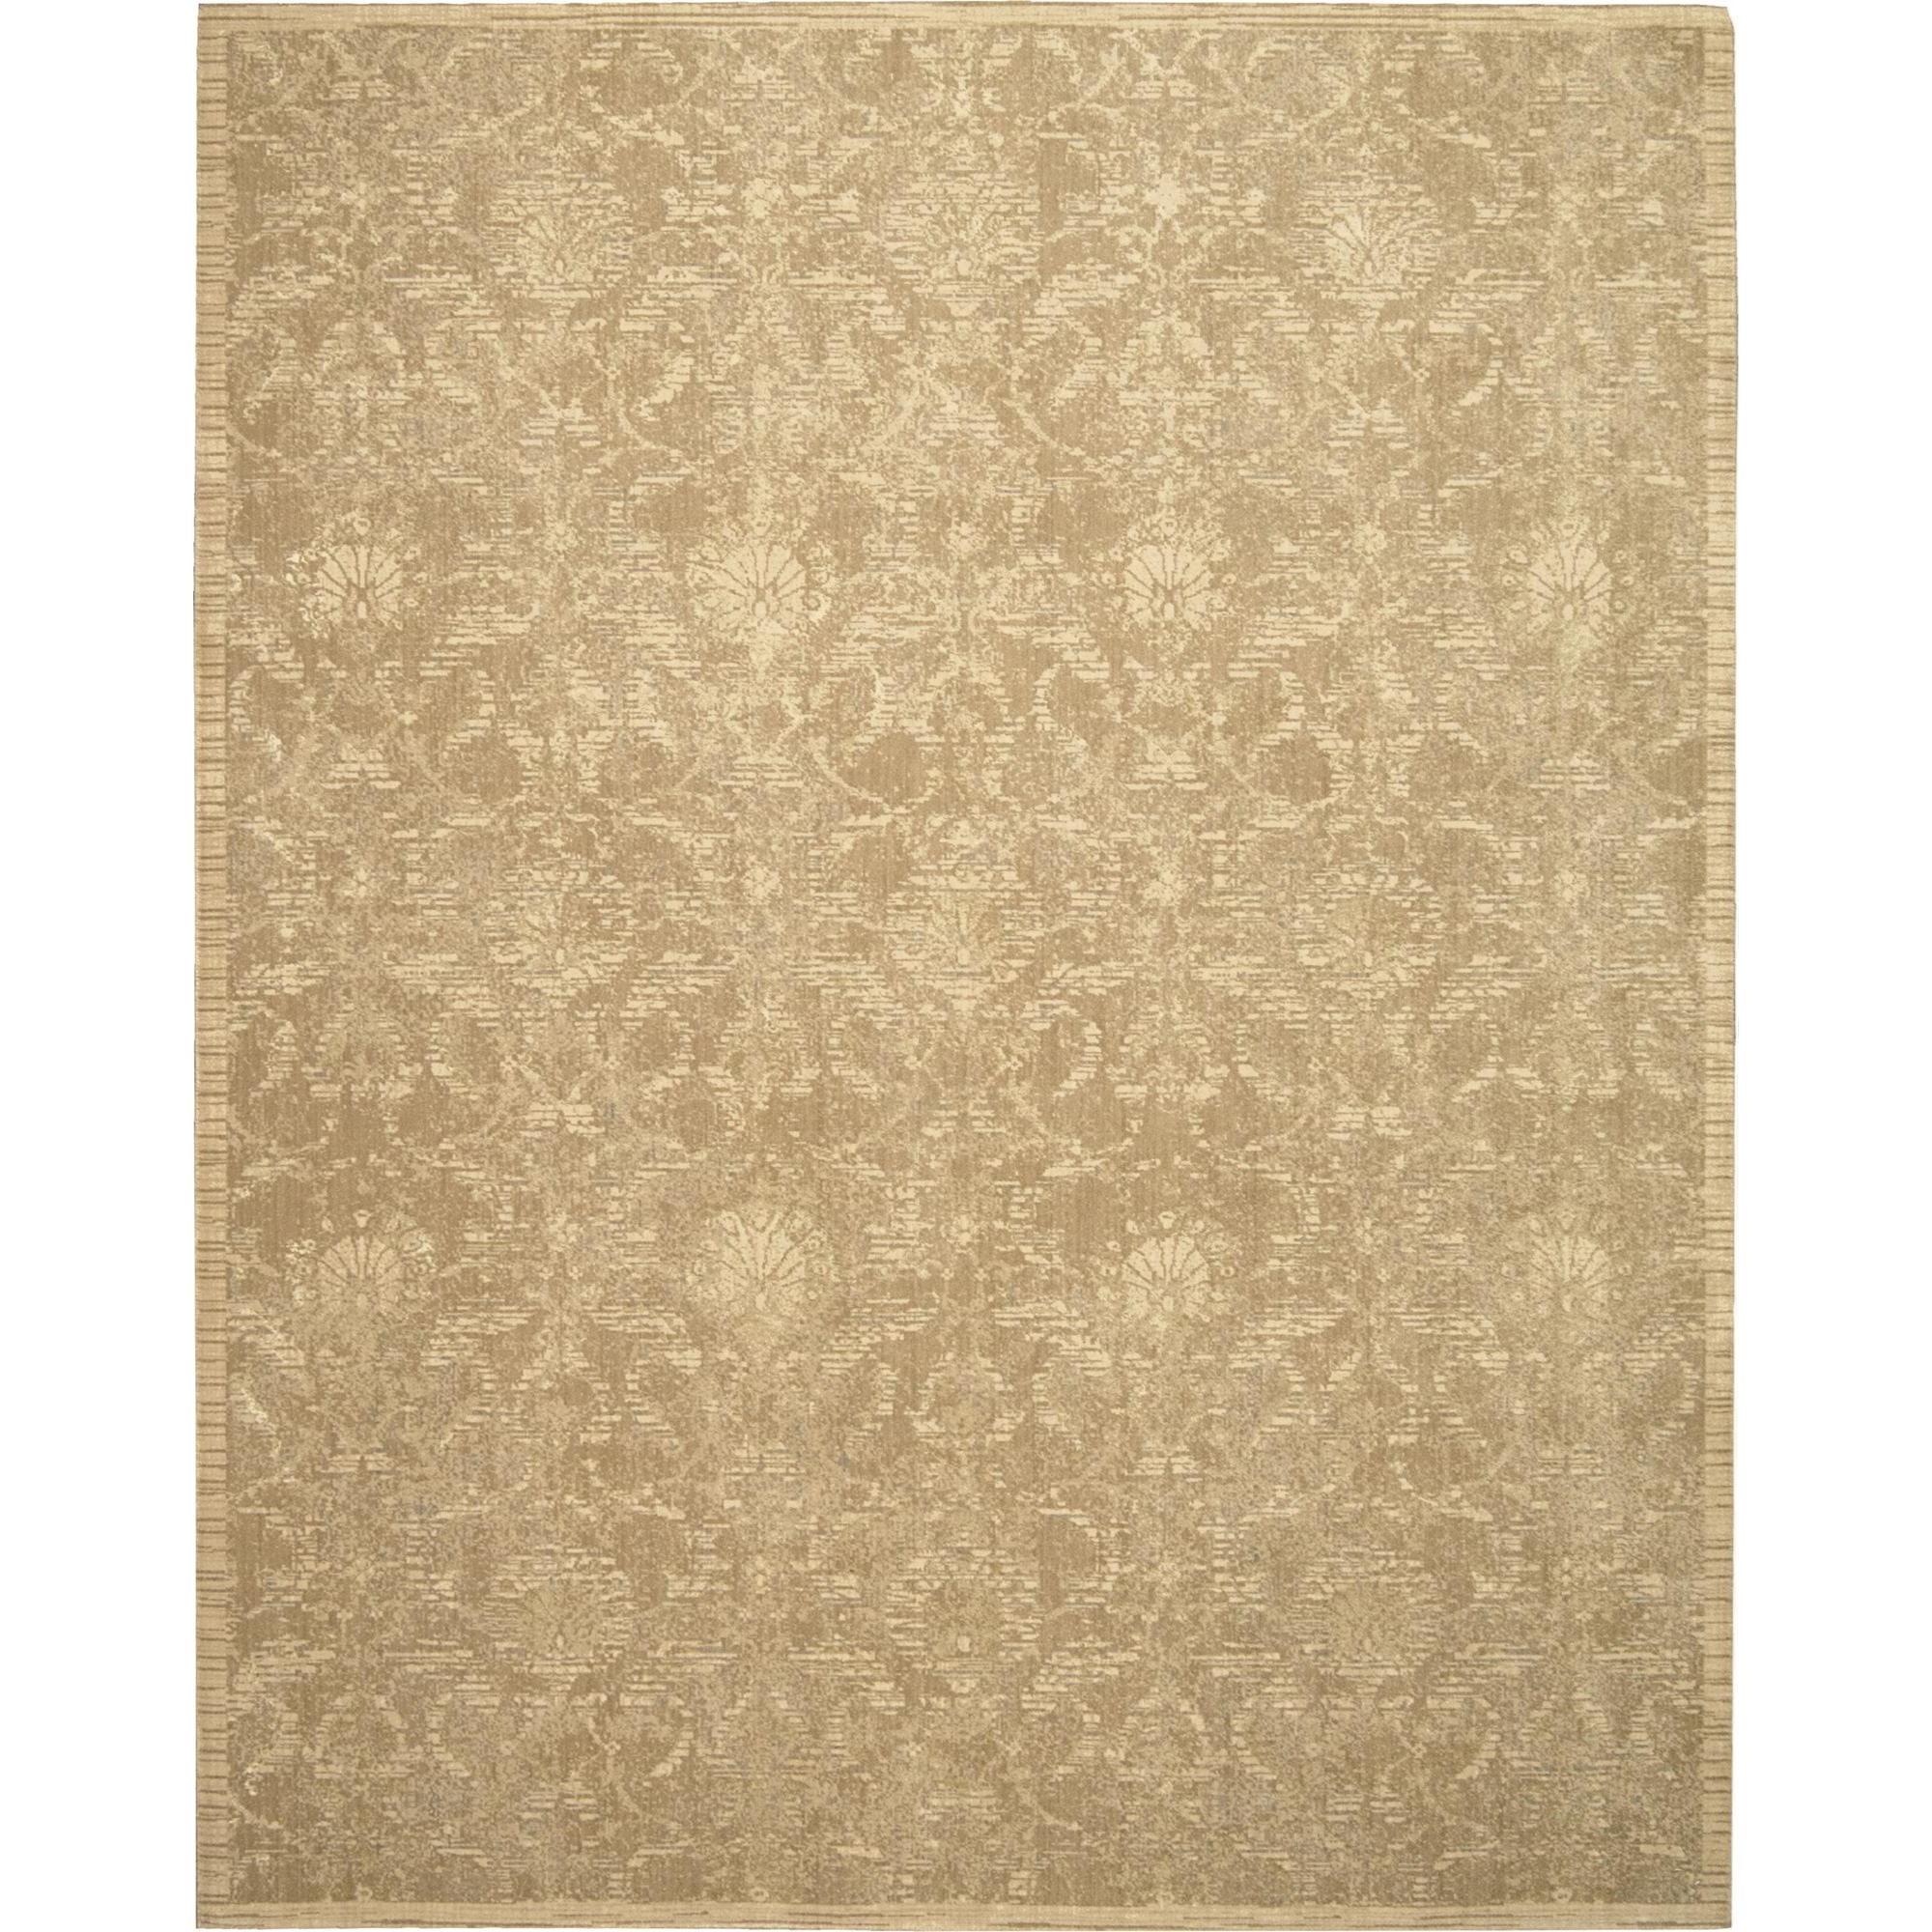 "Nourison Silk Elements 8'6"" x 11'6"" Sand Area Rug - Item Number: 18911"